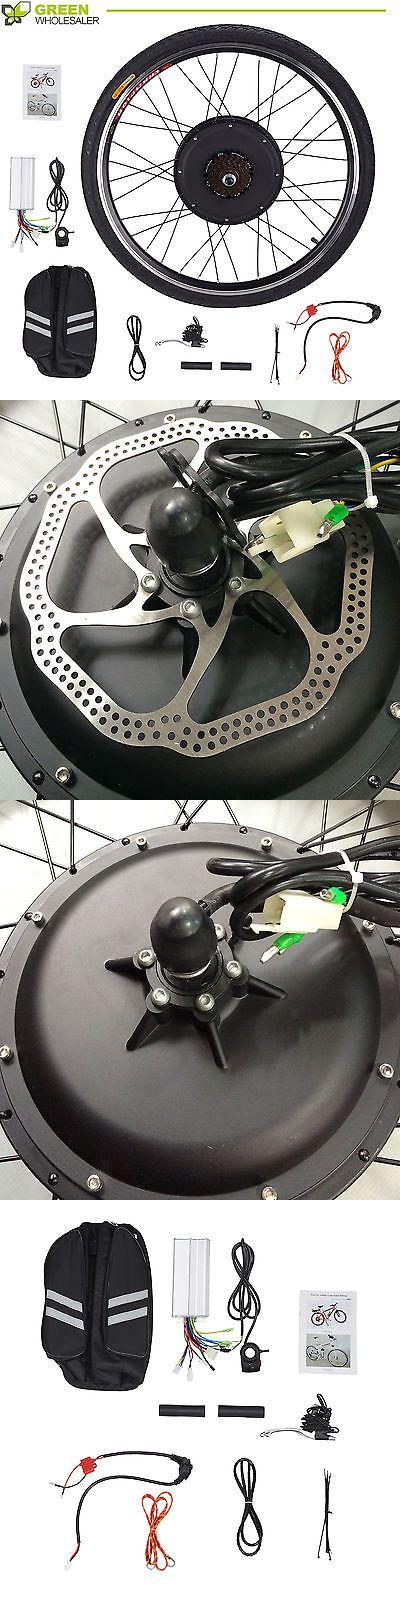 Electric Bicycles 74469: 48V Electronic Bike Conversion Kit W Motor Rear Wheel Hub Speed 26''1000W -> BUY IT NOW ONLY: $150.99 on eBay!